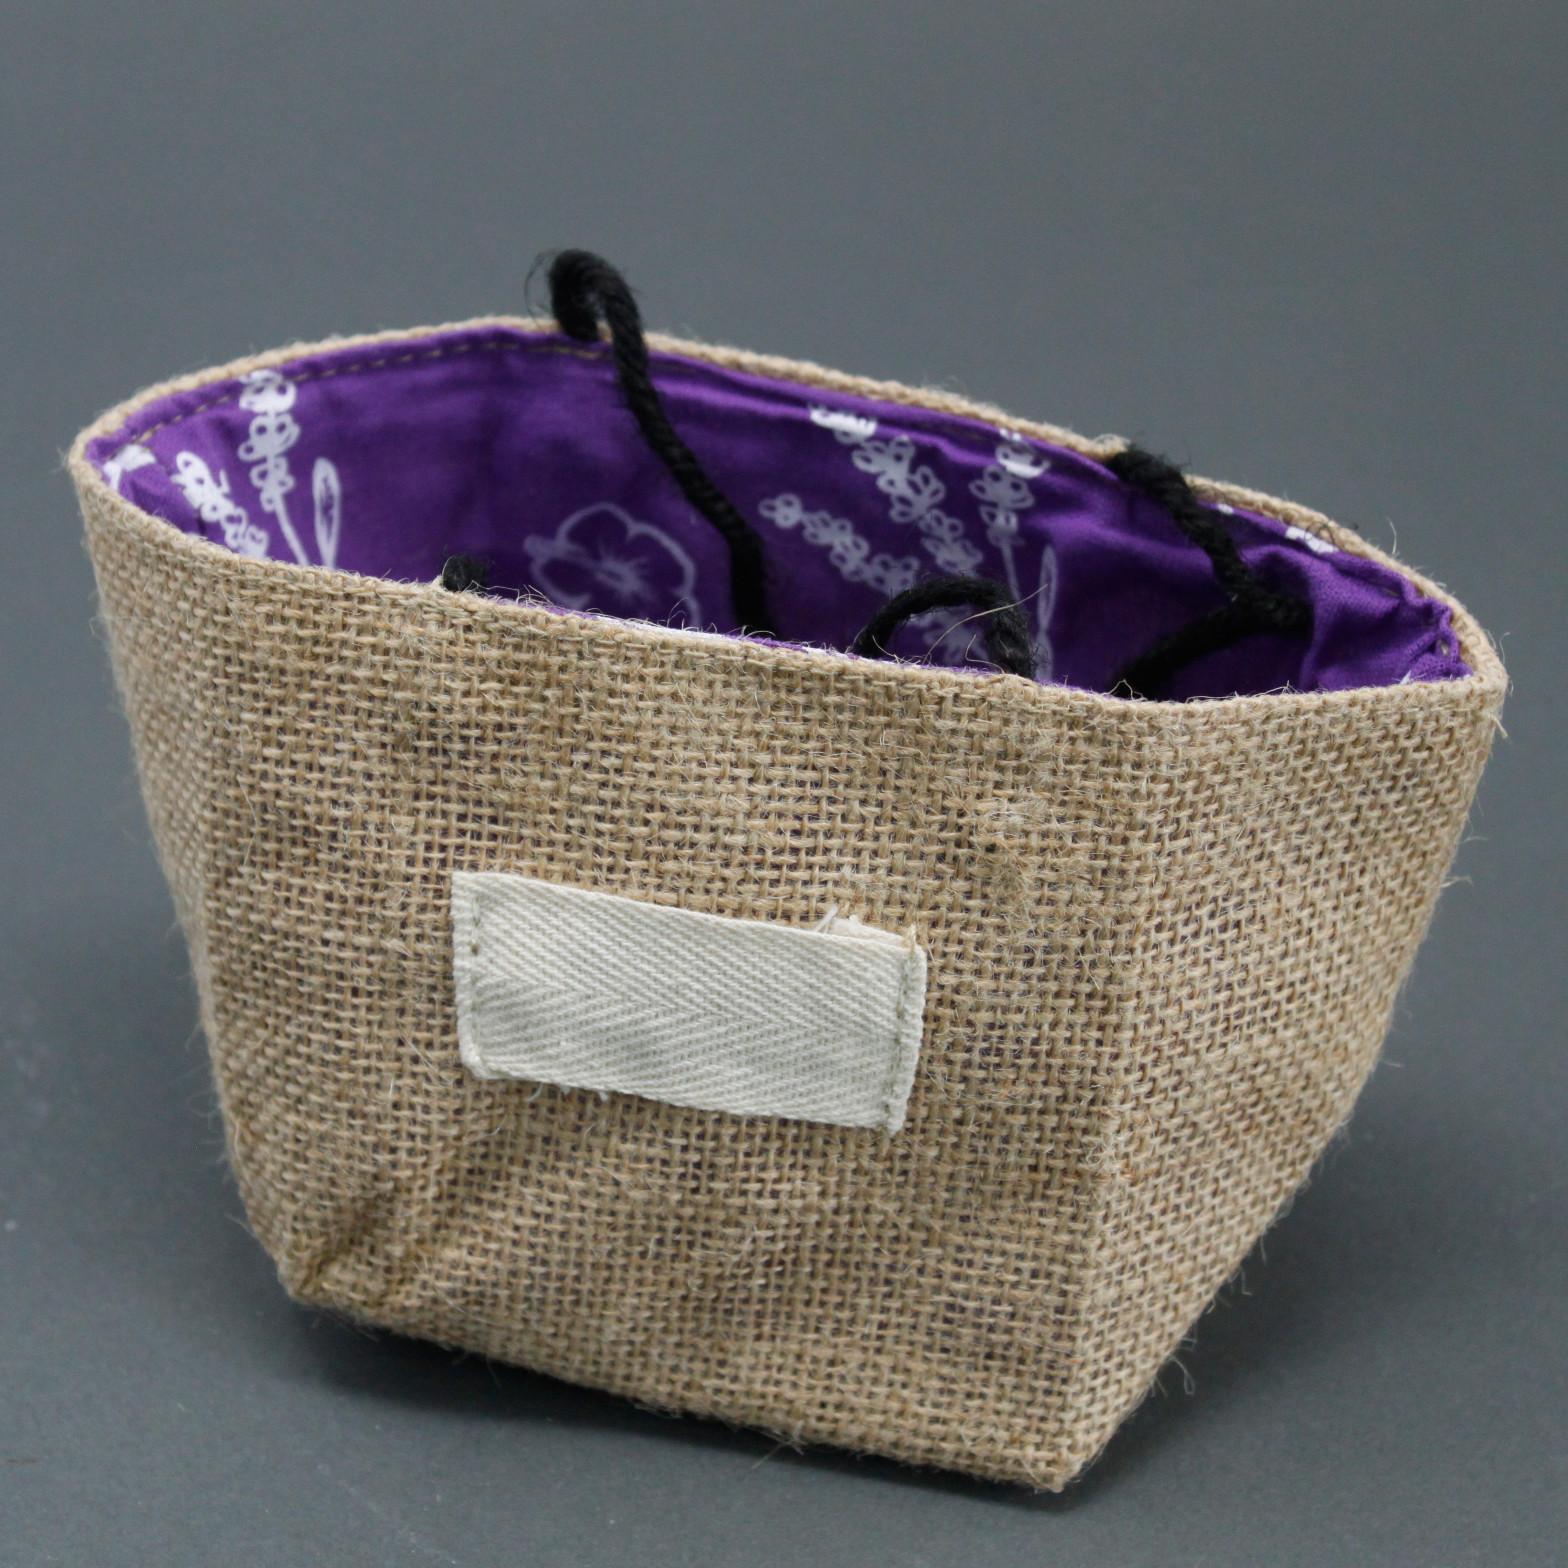 Natural Jute Cotton Gift Bag Lavender Lining Medium